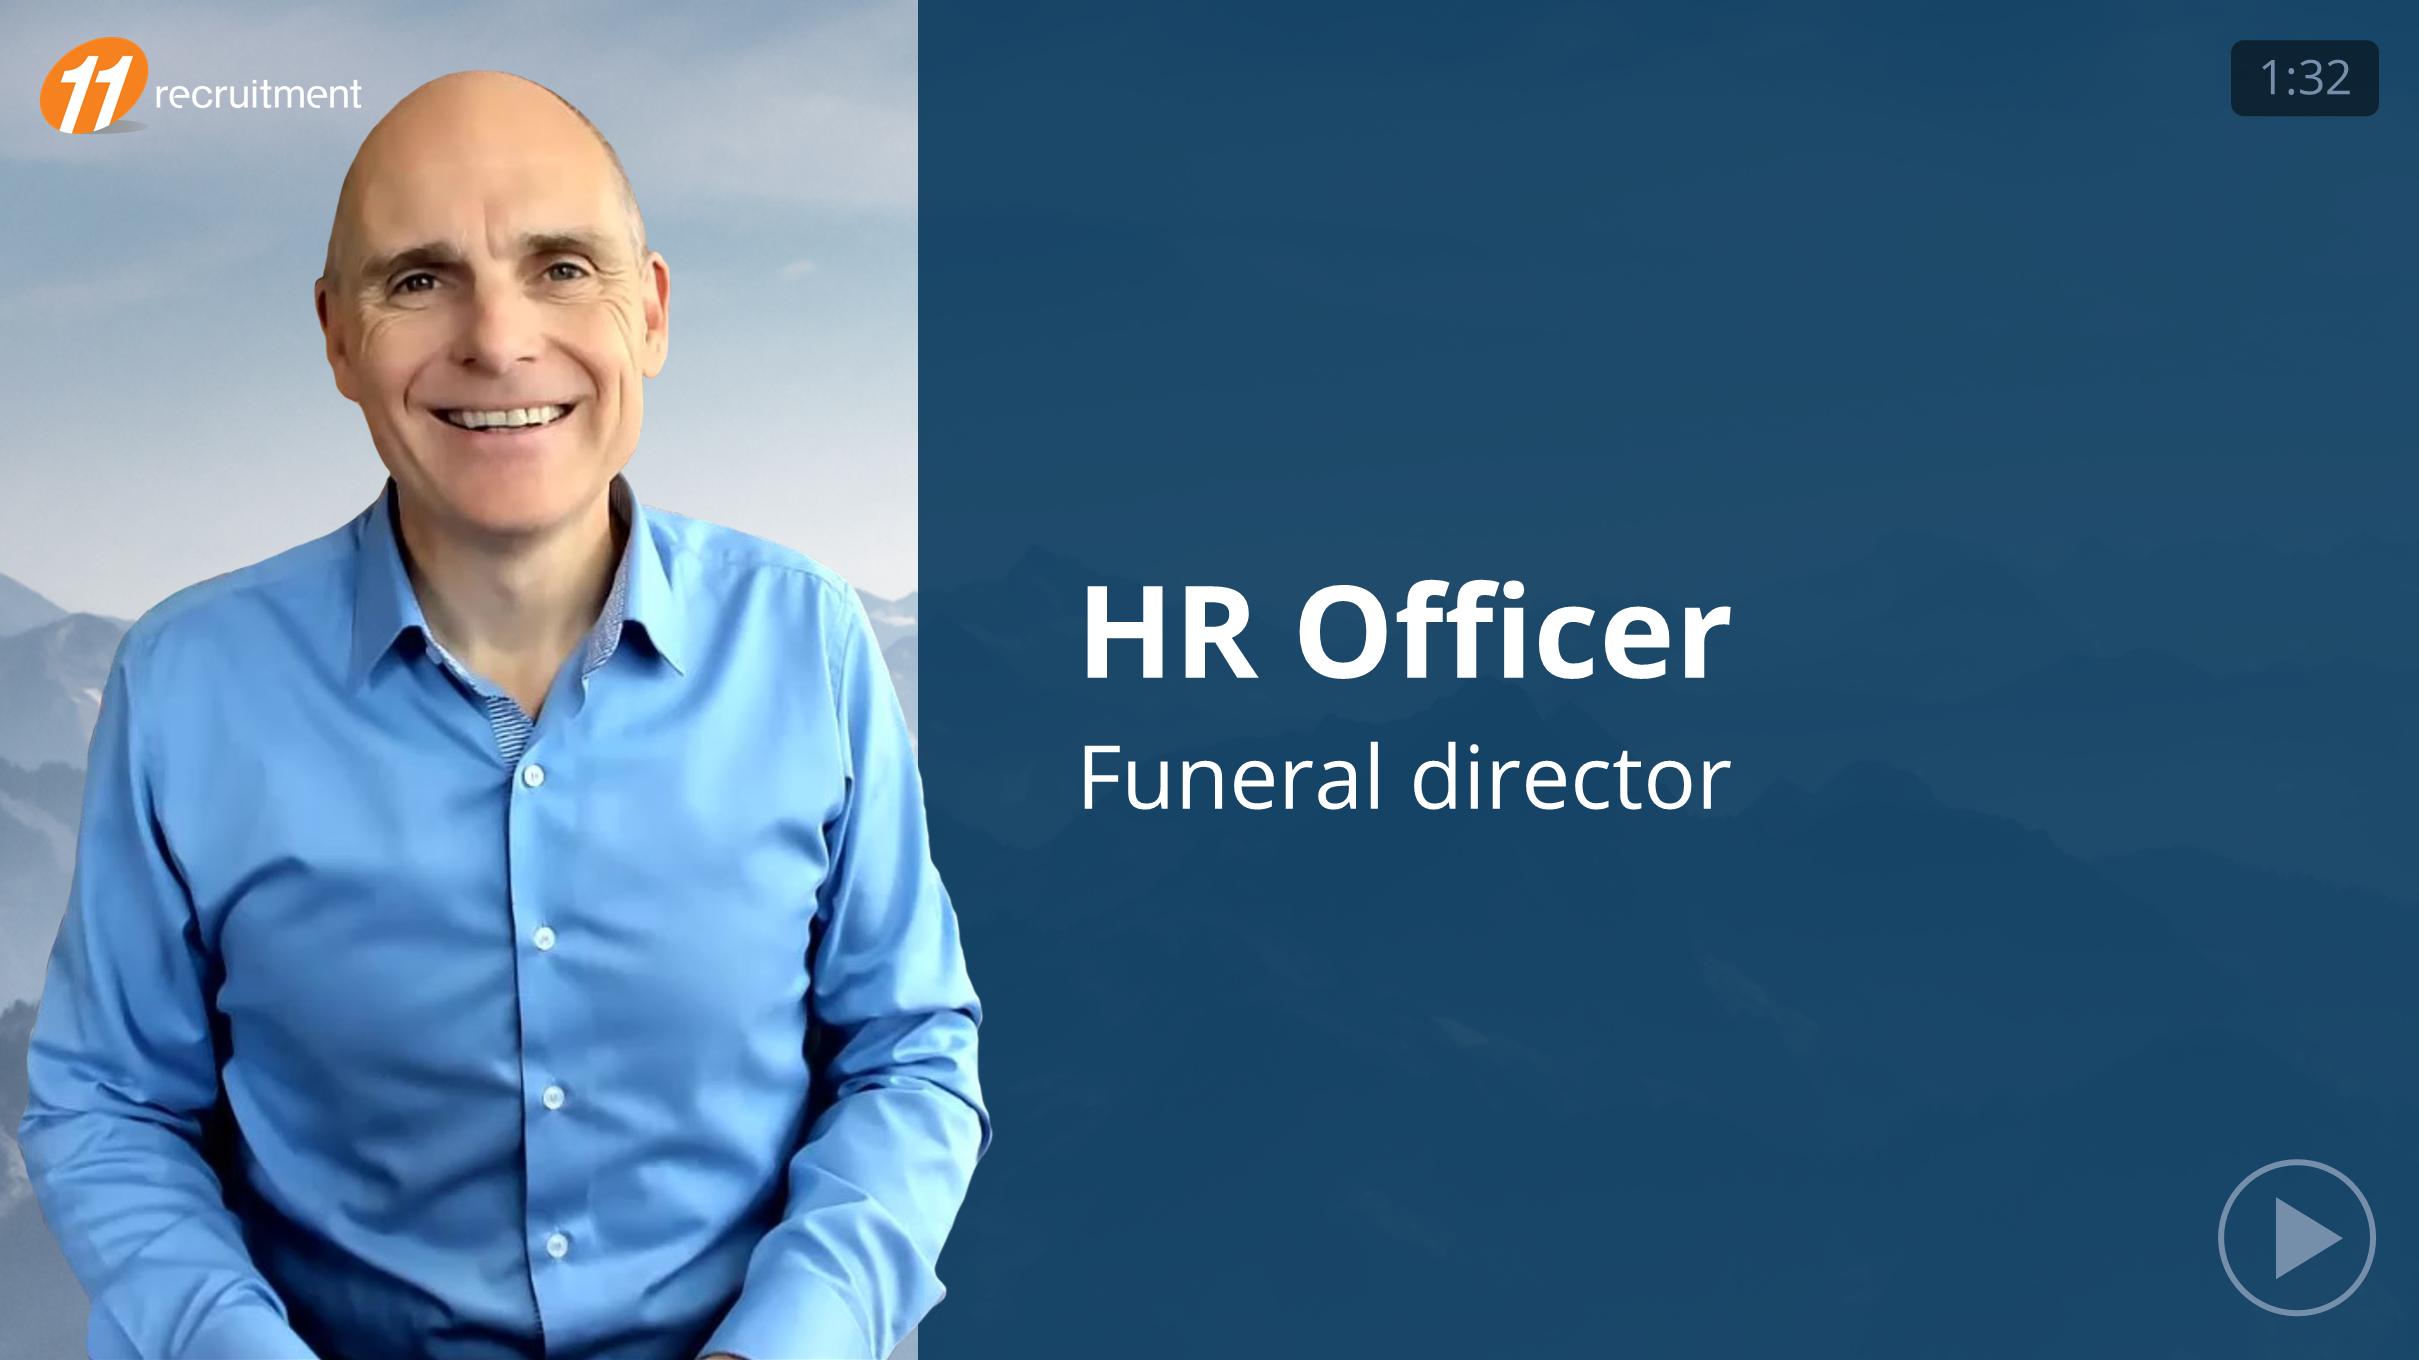 HR Officer - Funeral